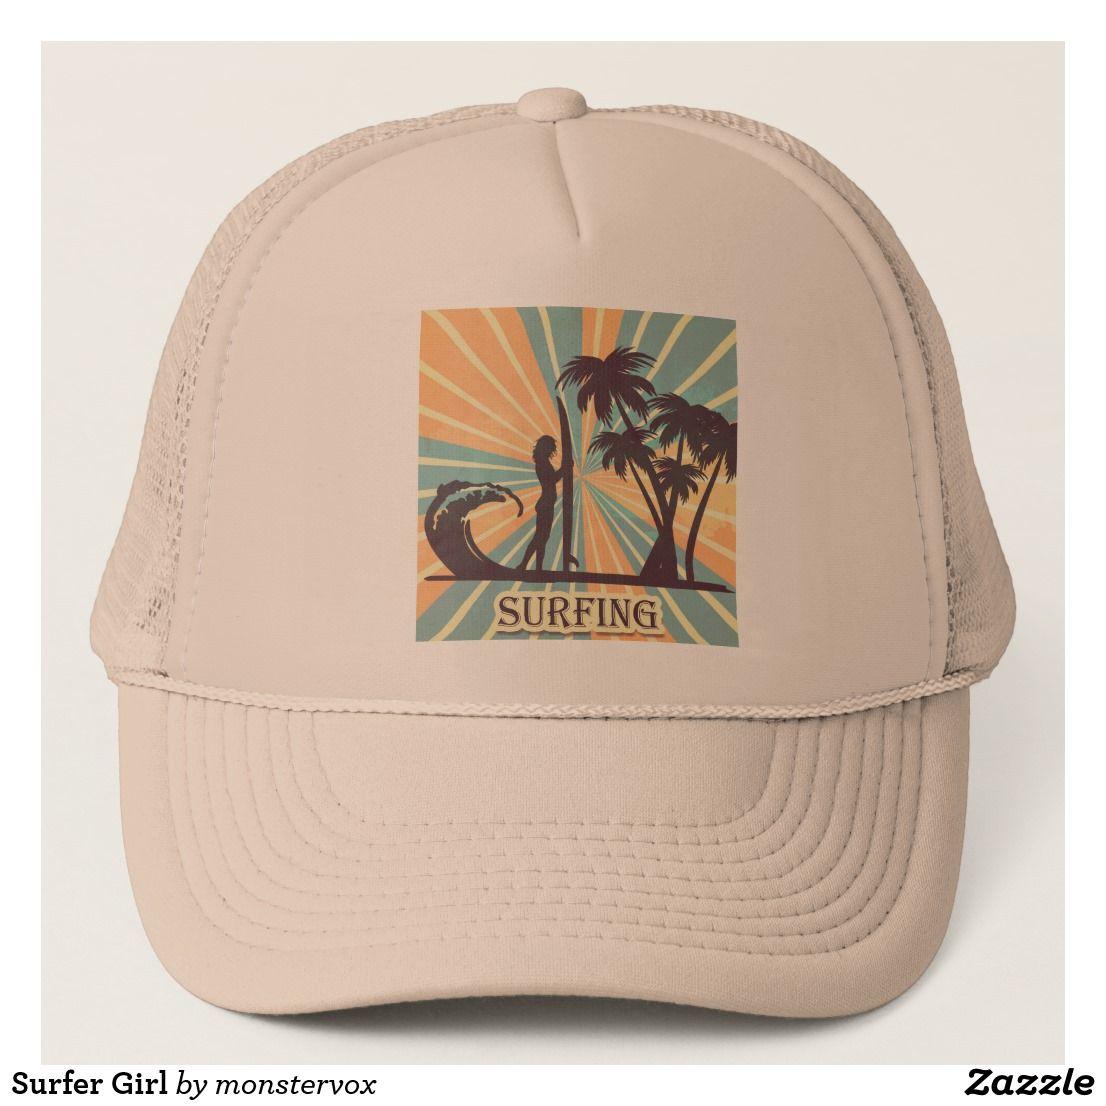 f6645ed0 Surfer Girl Trucker Hat #Surfer #Surf #Surfboard #PalmTree #Wave #Beach # Ocean #Sport #Exercise #Fashion #Trucker #Hat #Cap